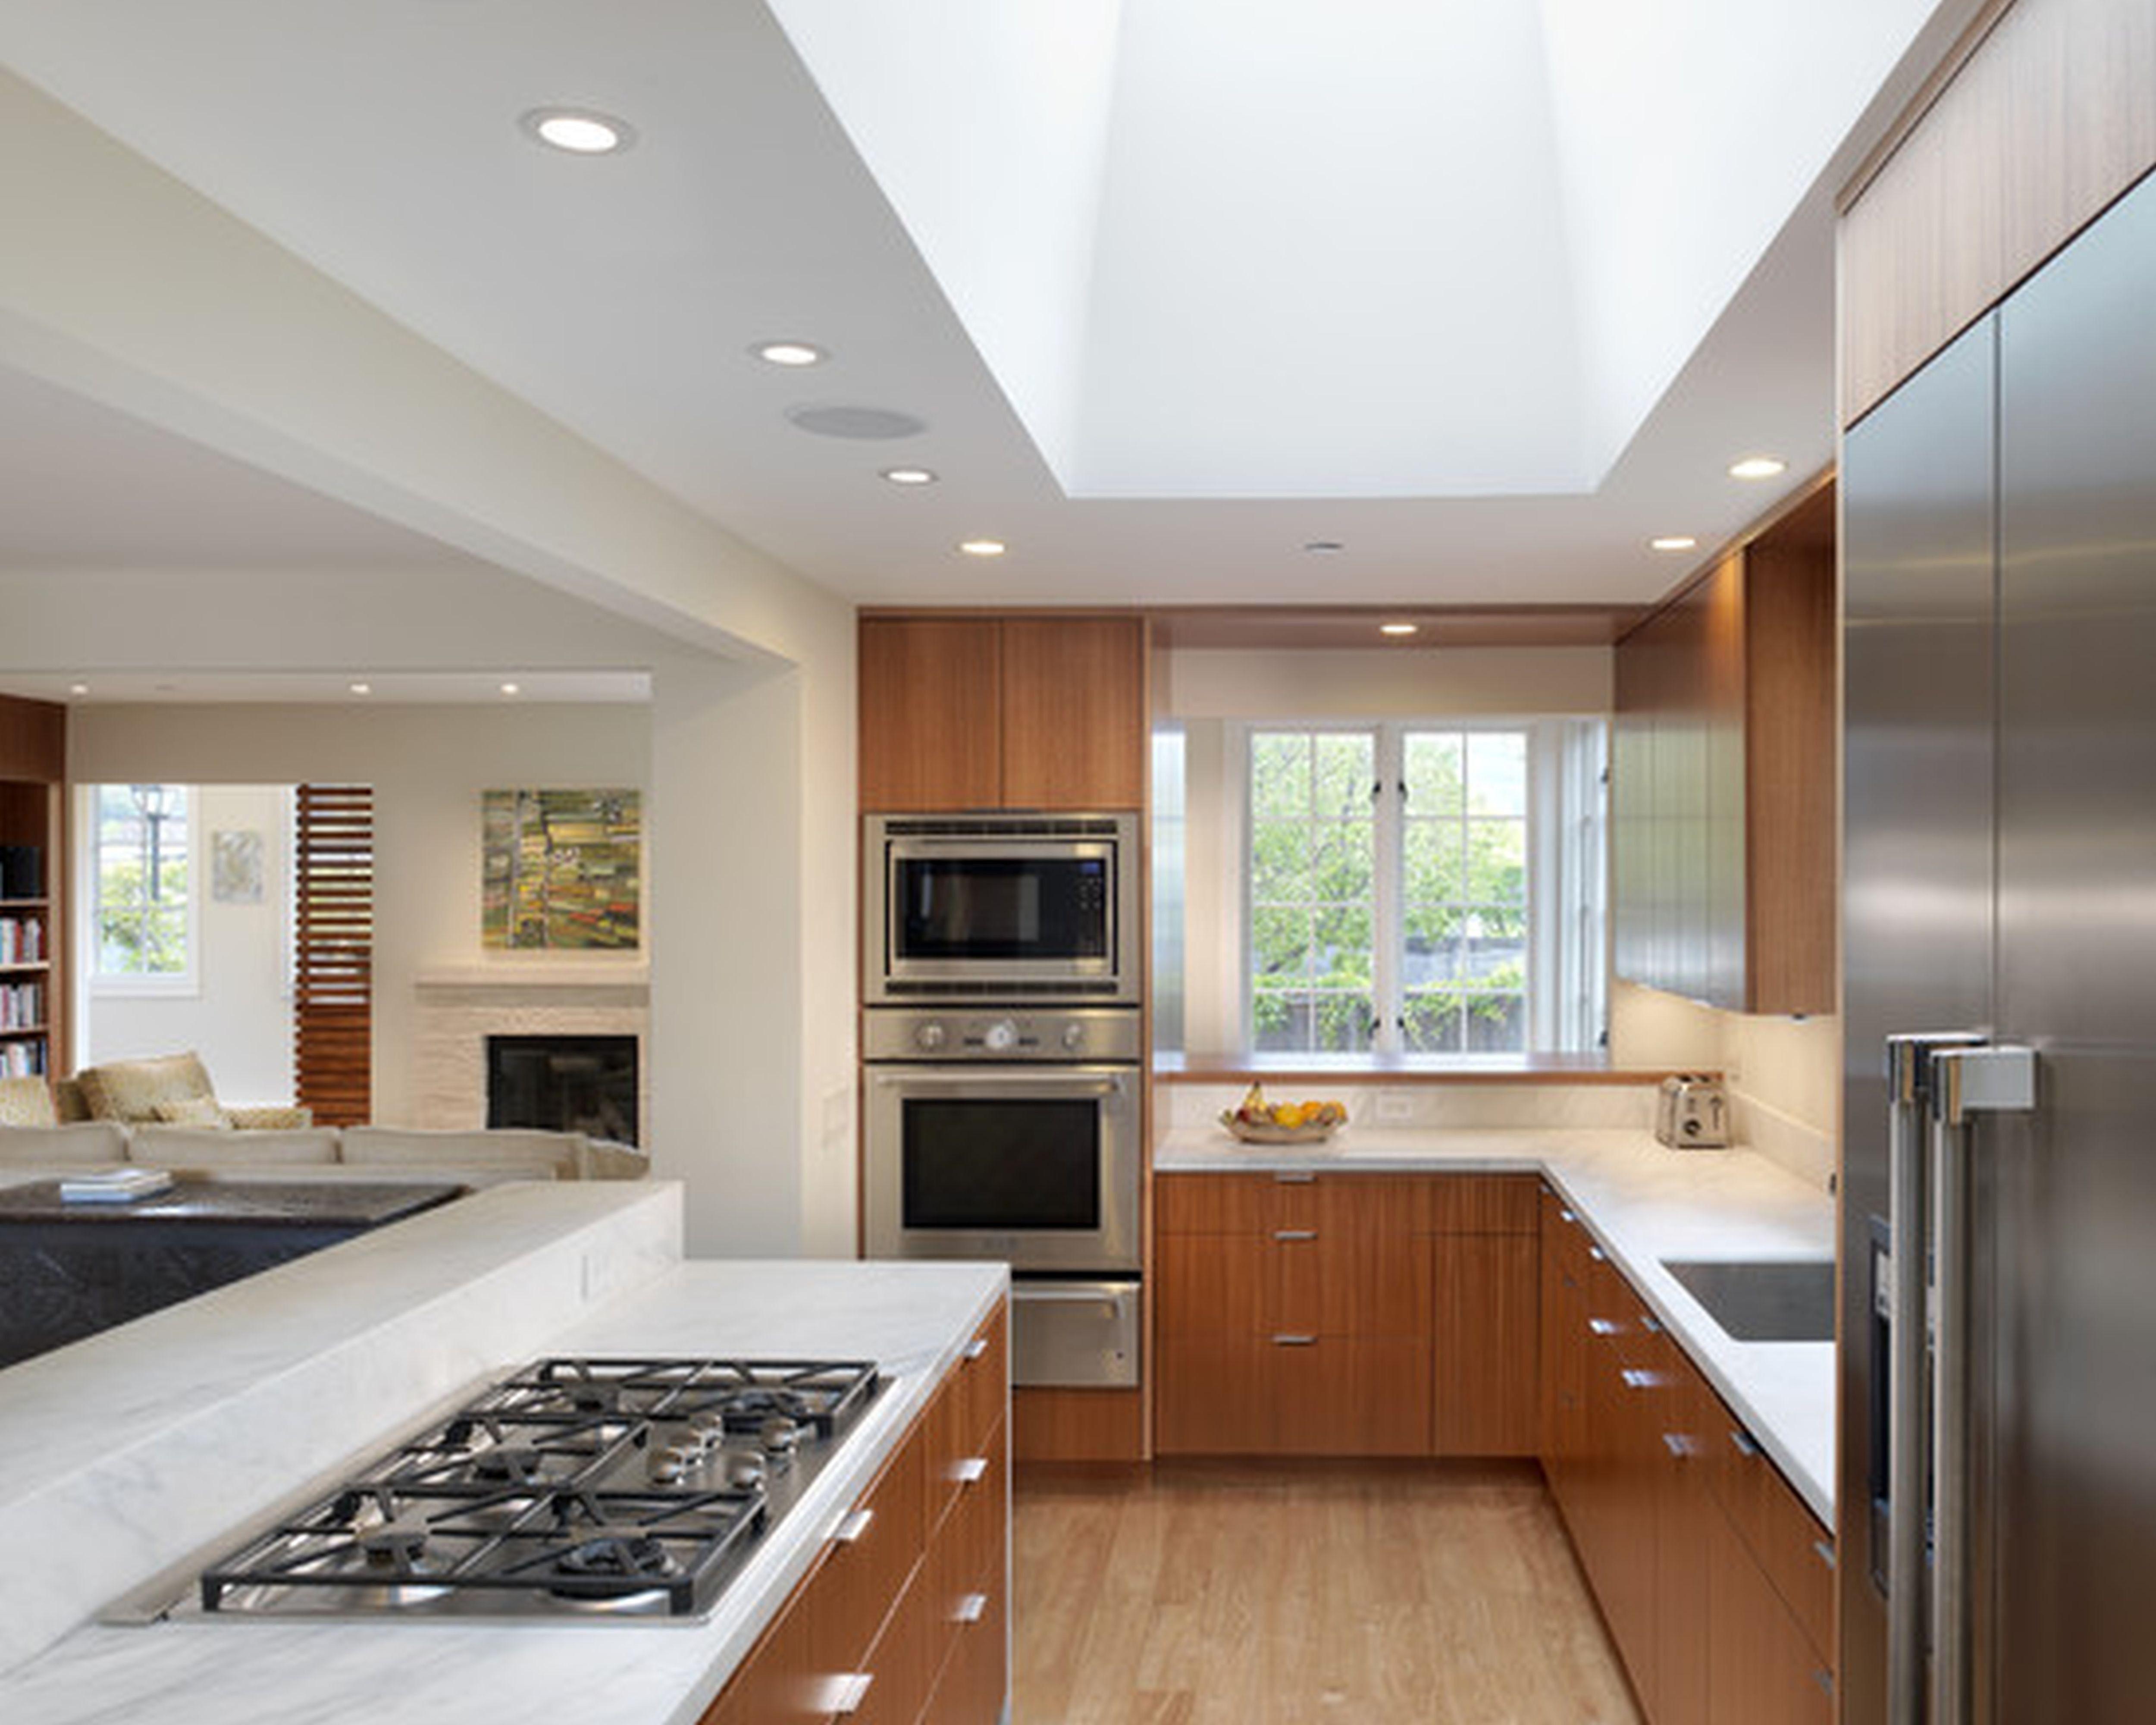 Lovely Mid Century Modern Kitchen Remodel 25 Inspired Ideas